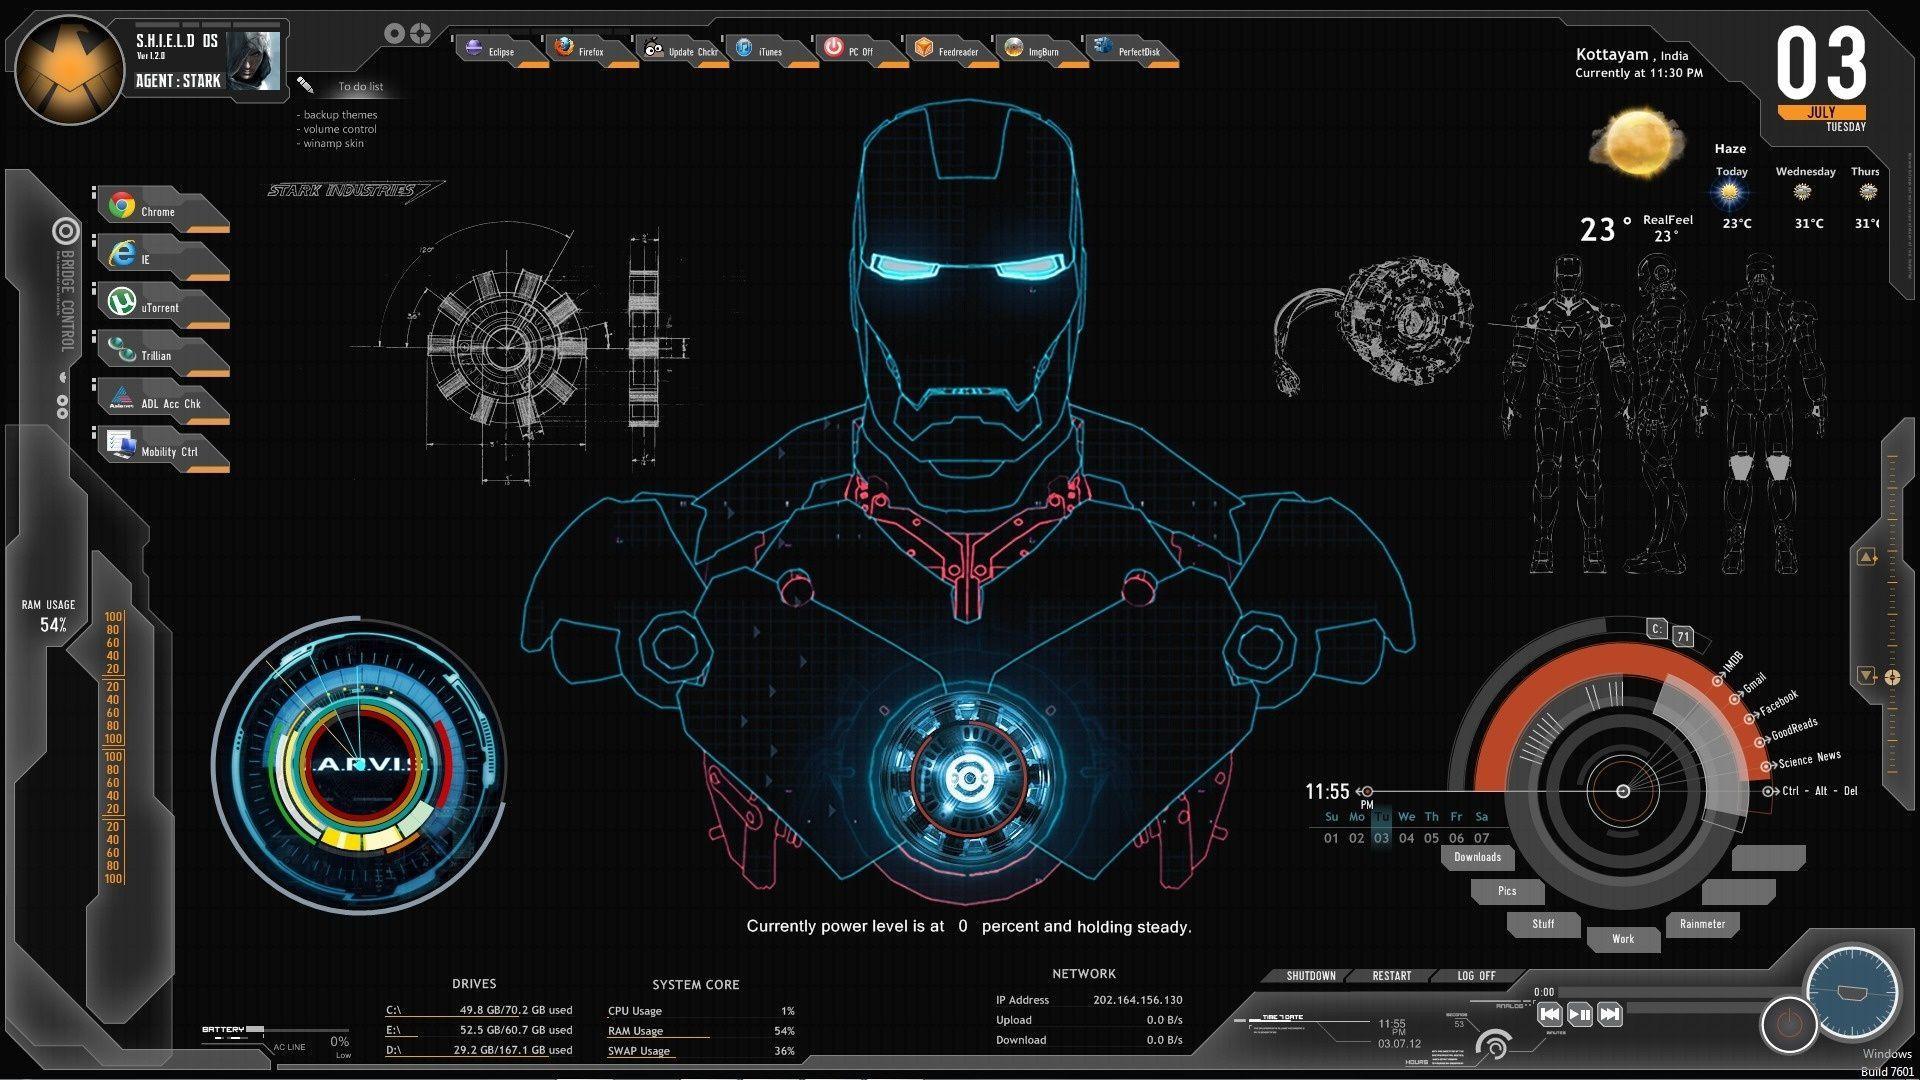 Iron man stark industries hd wallpapers wallpaper cave for Sfondi iron man